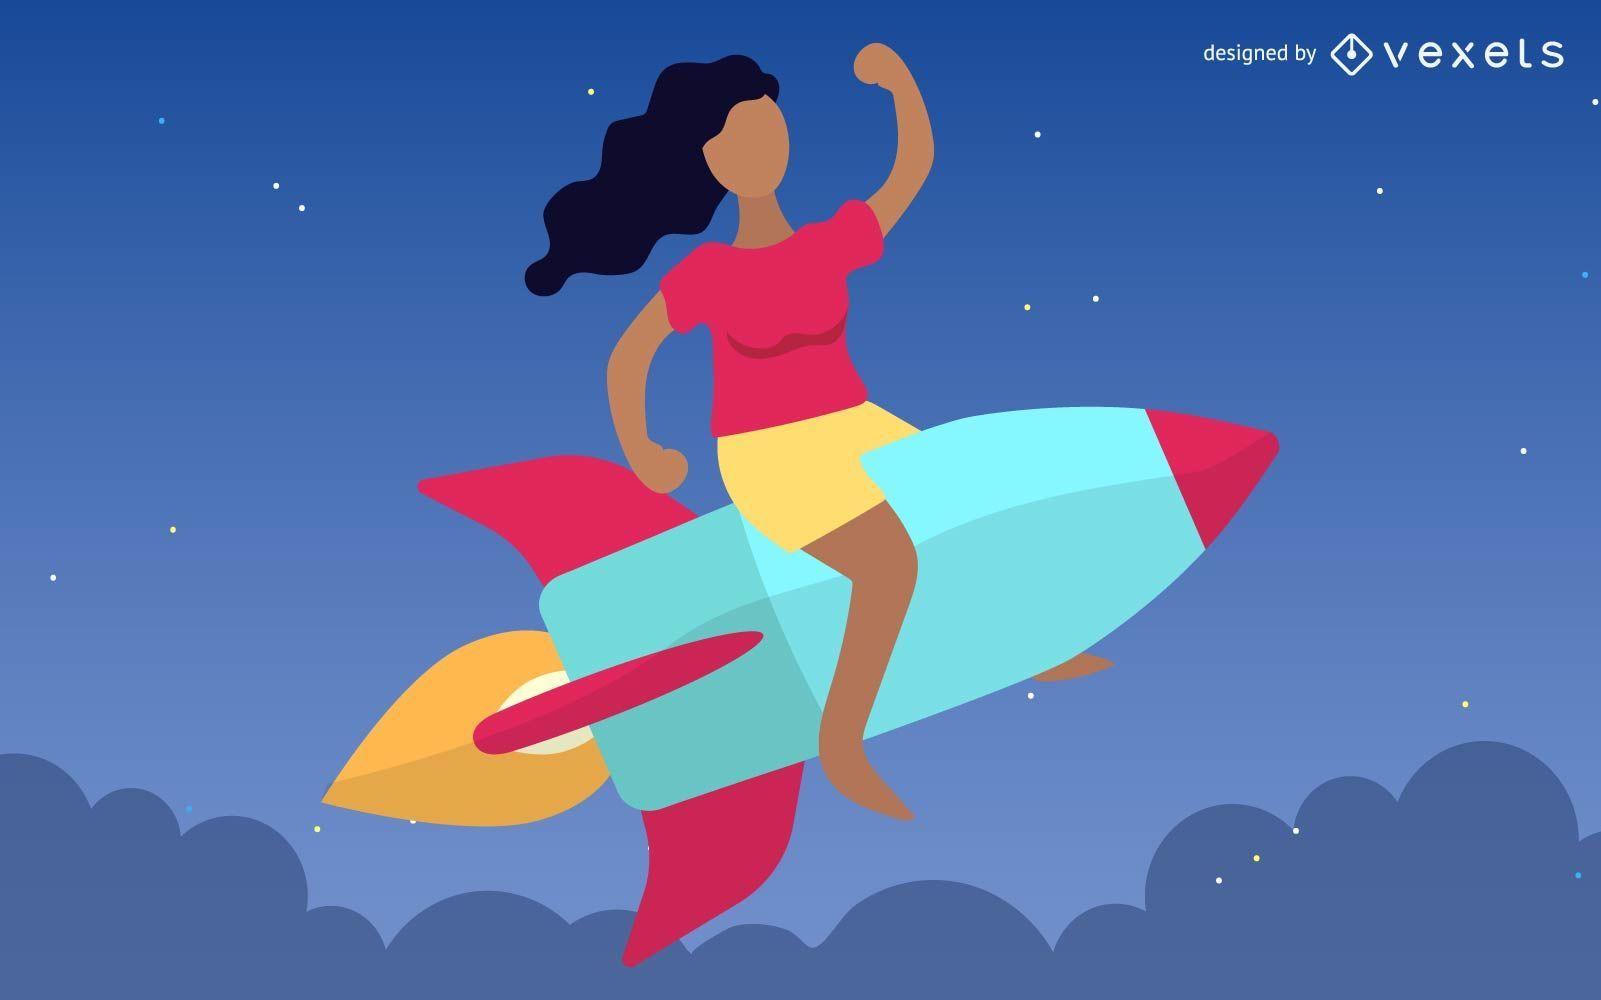 Chica montando cohete con misiles